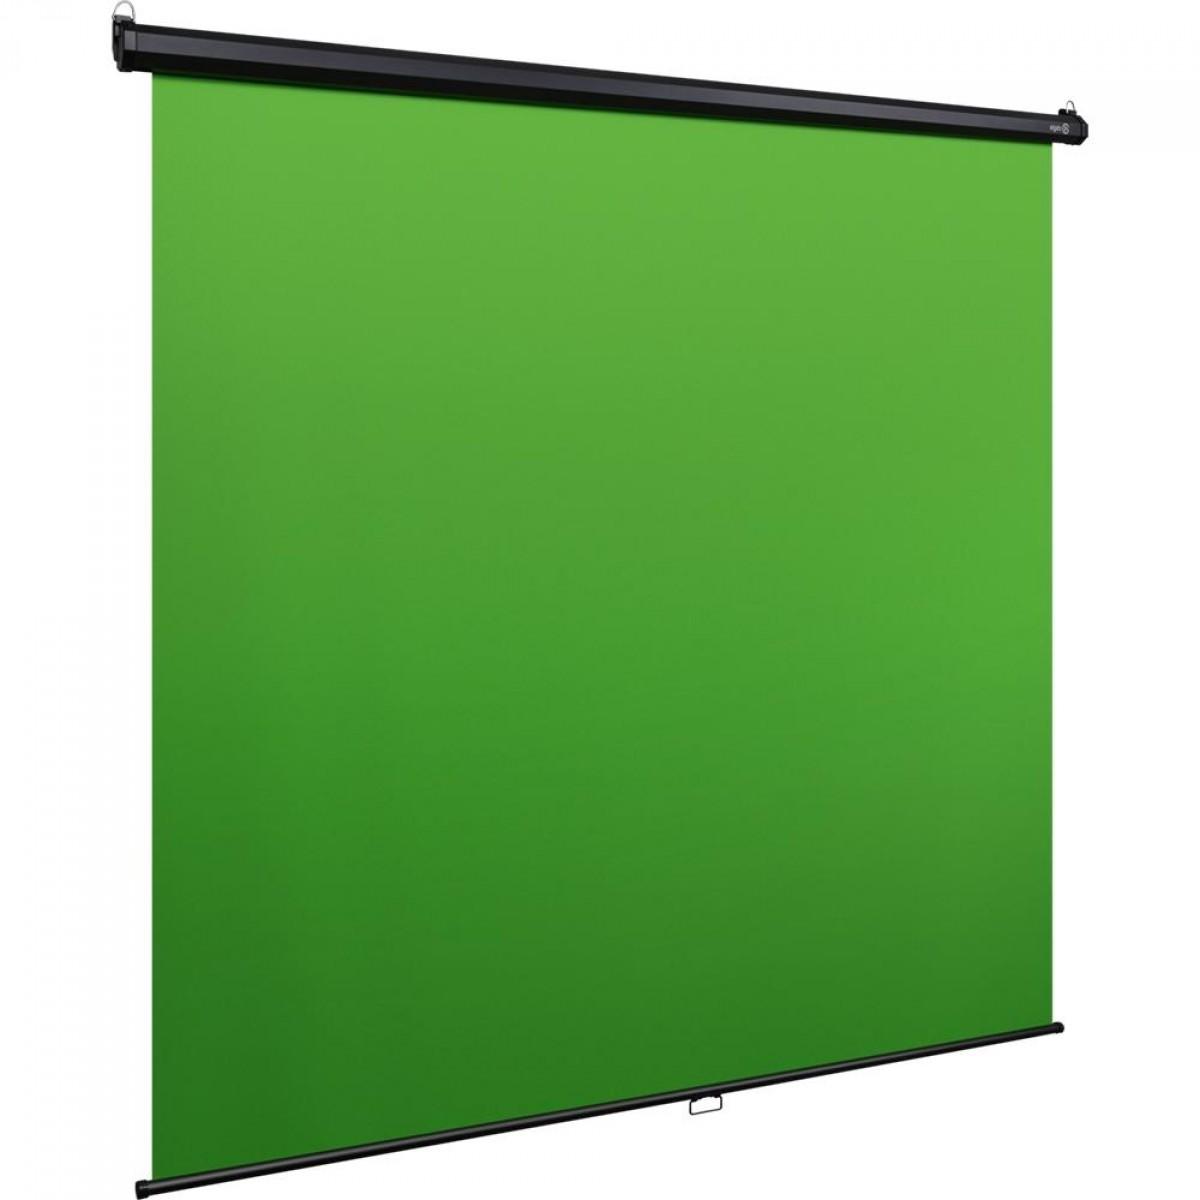 Tela Verde Elgato MT, Chroma Key, Painel Dobrável, 10GAO9901